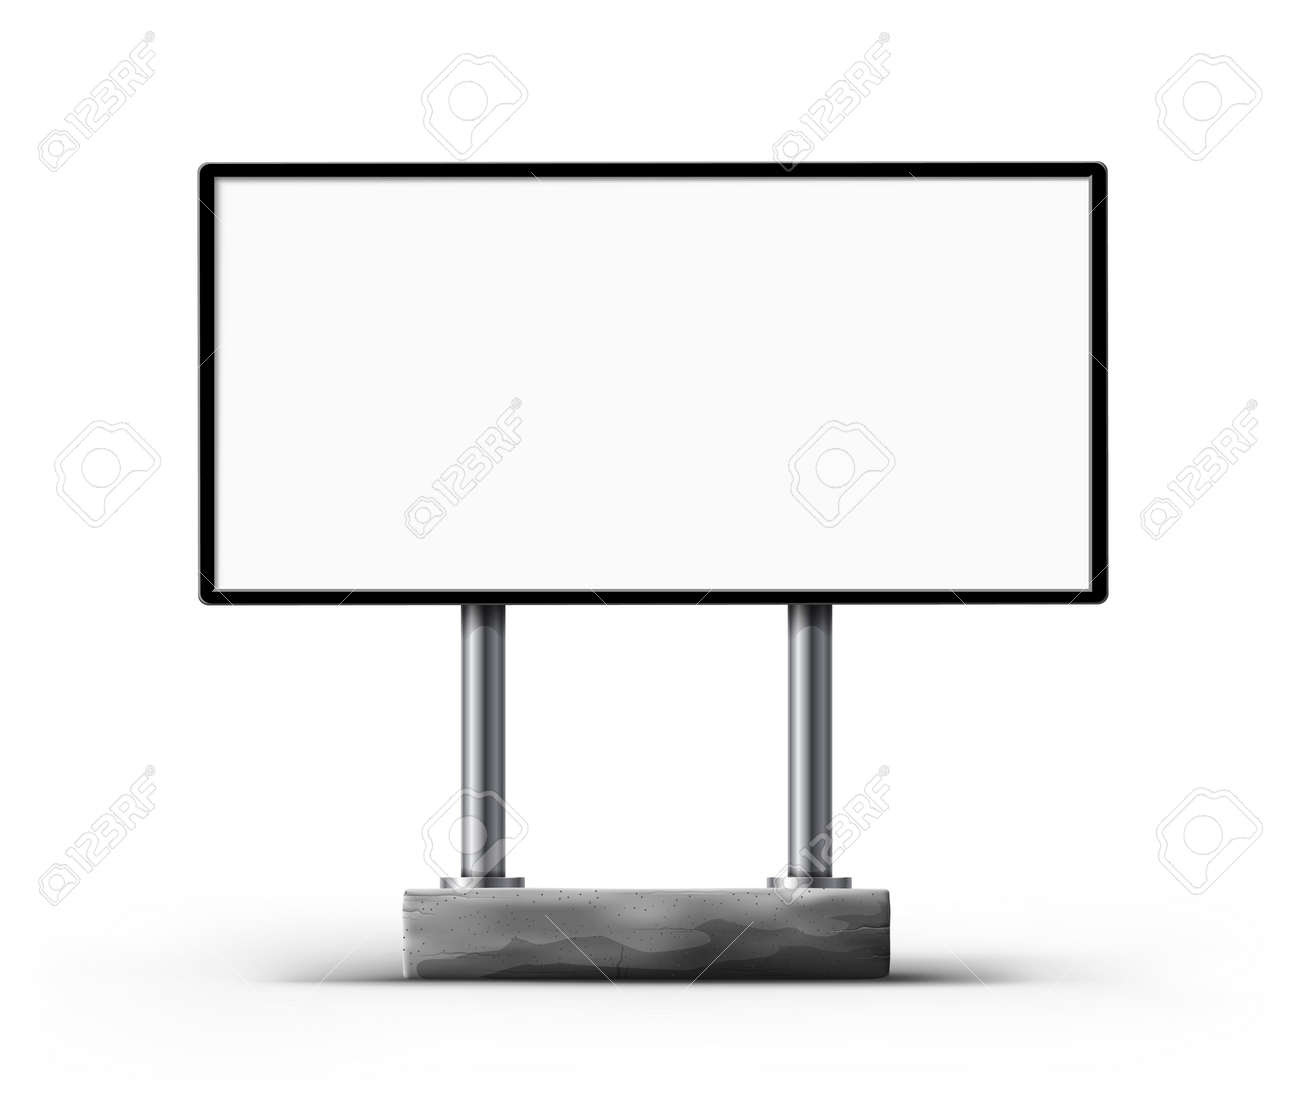 Blank Street Billboard Template For Outdoor Advertisment Design ...